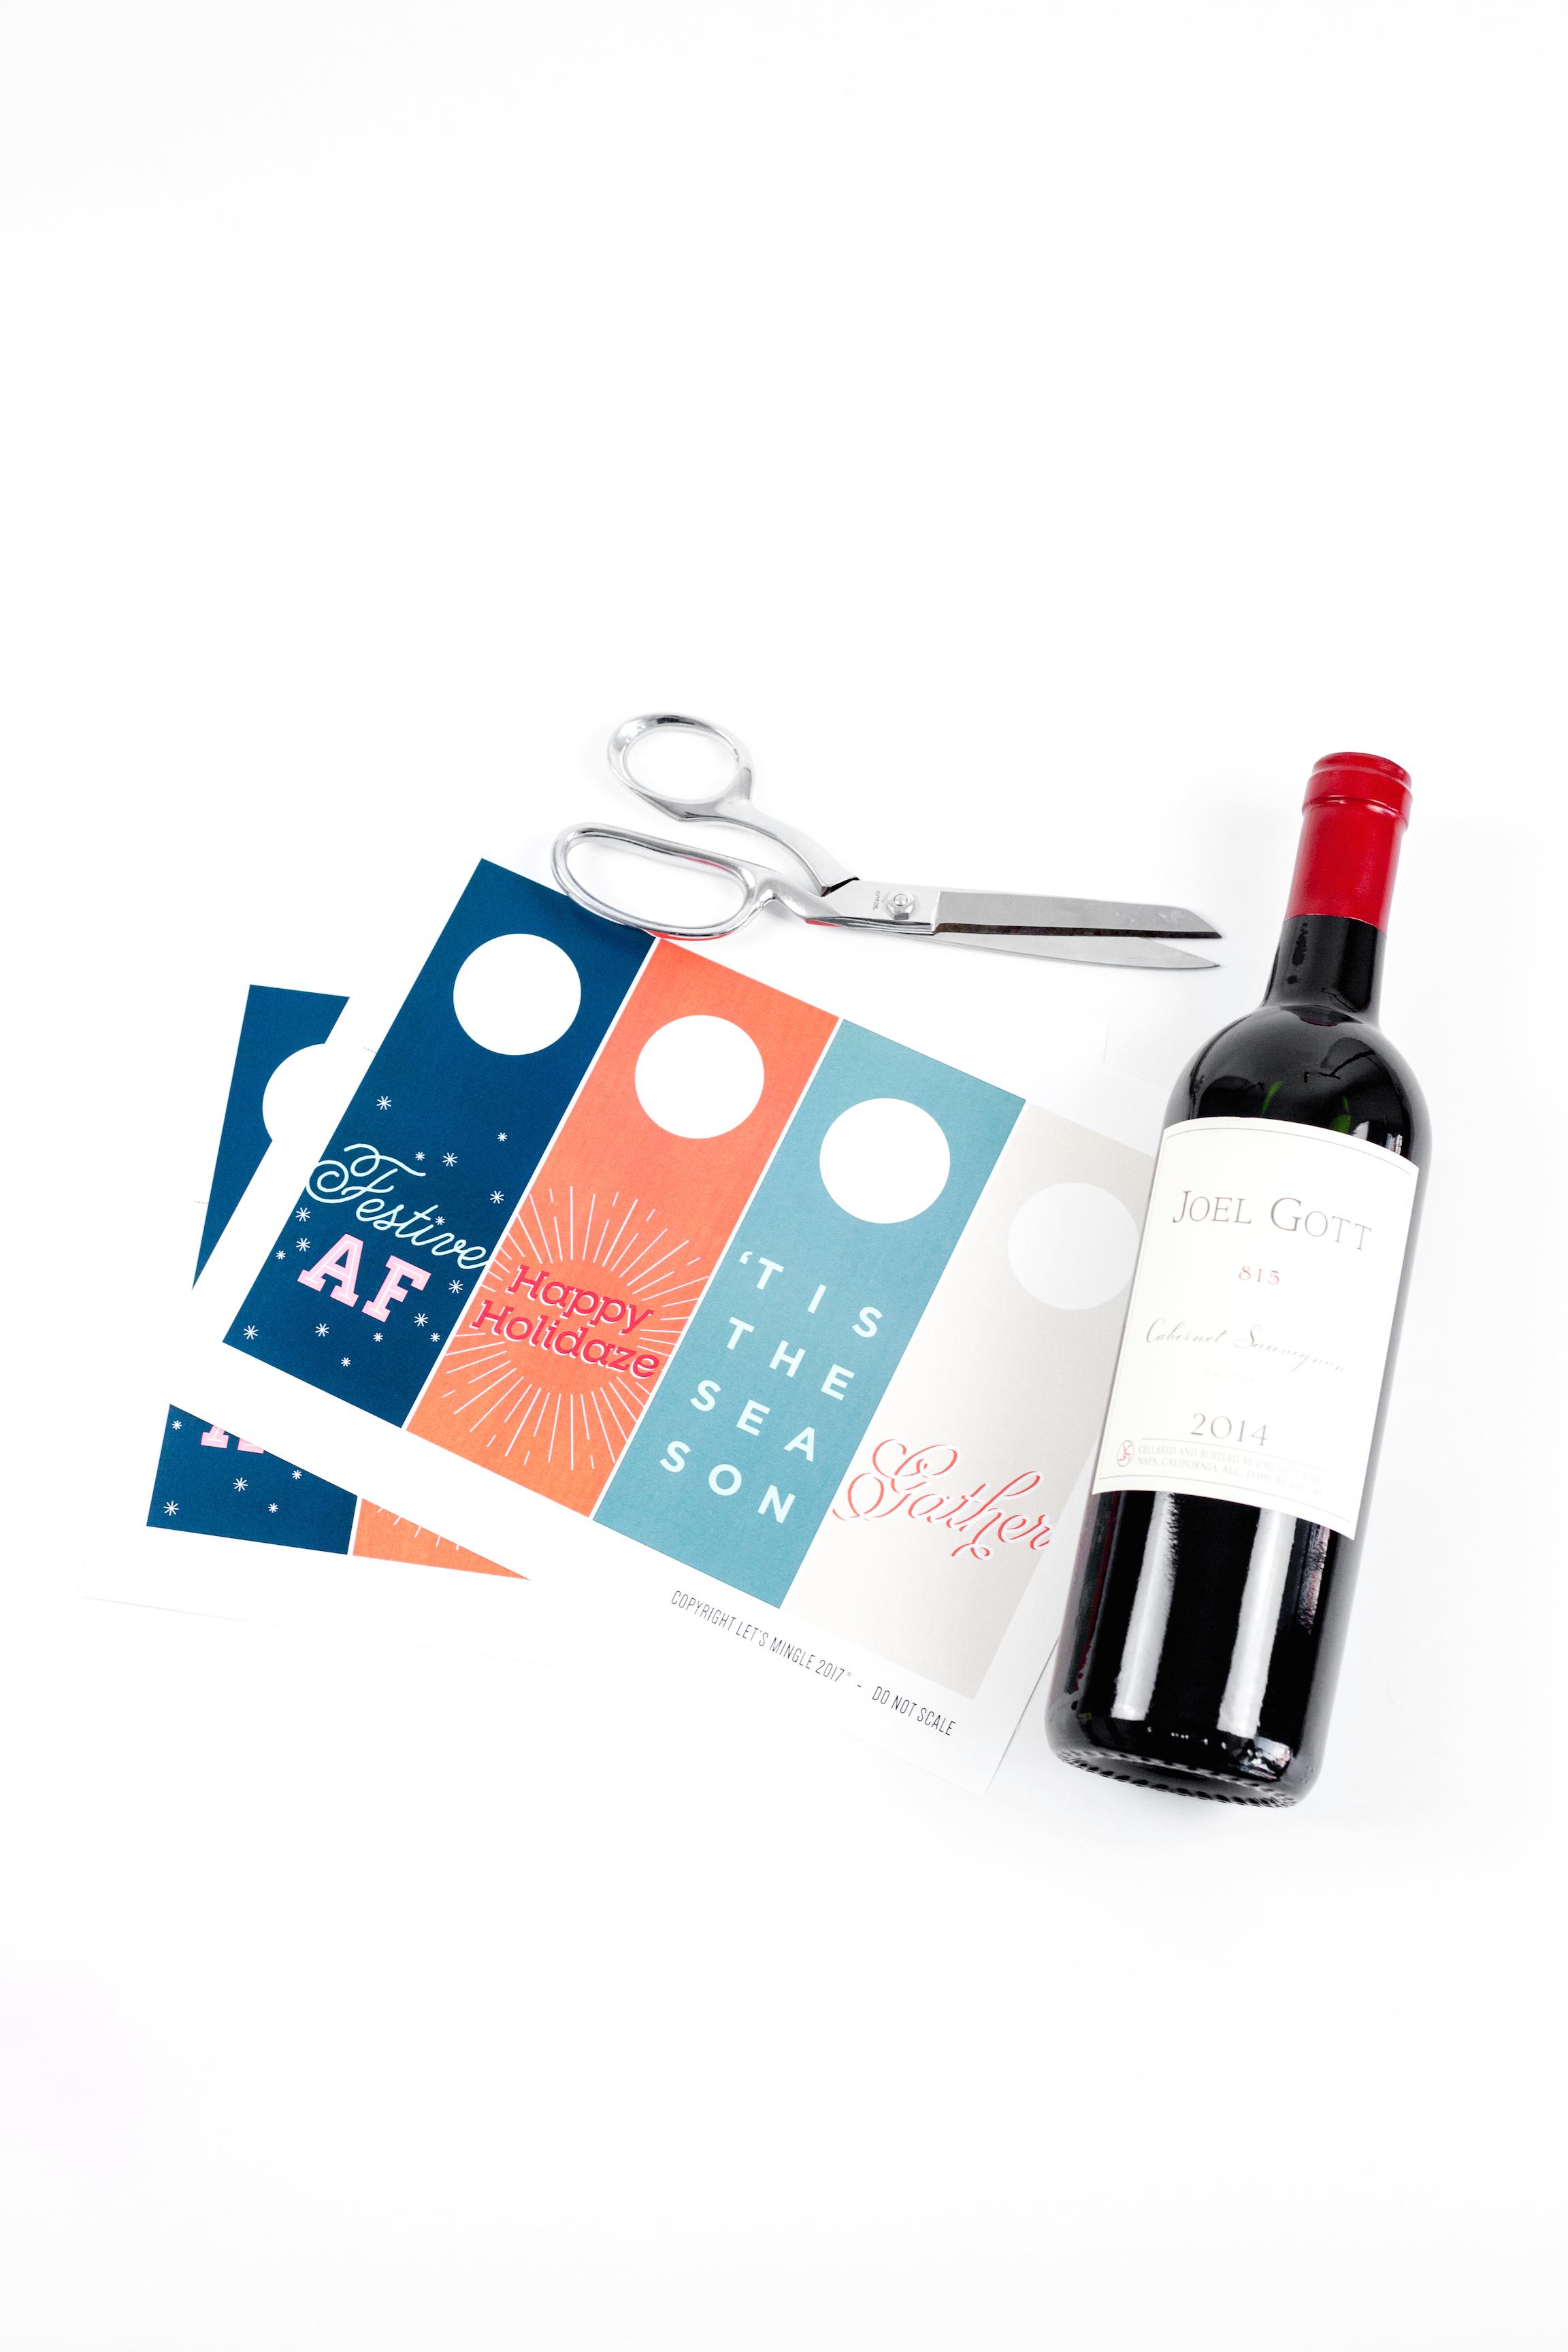 picture regarding Printable Wine Bottle Tags identified as Printable Wine Bottle Present Tags - Allows Mingle Weblog